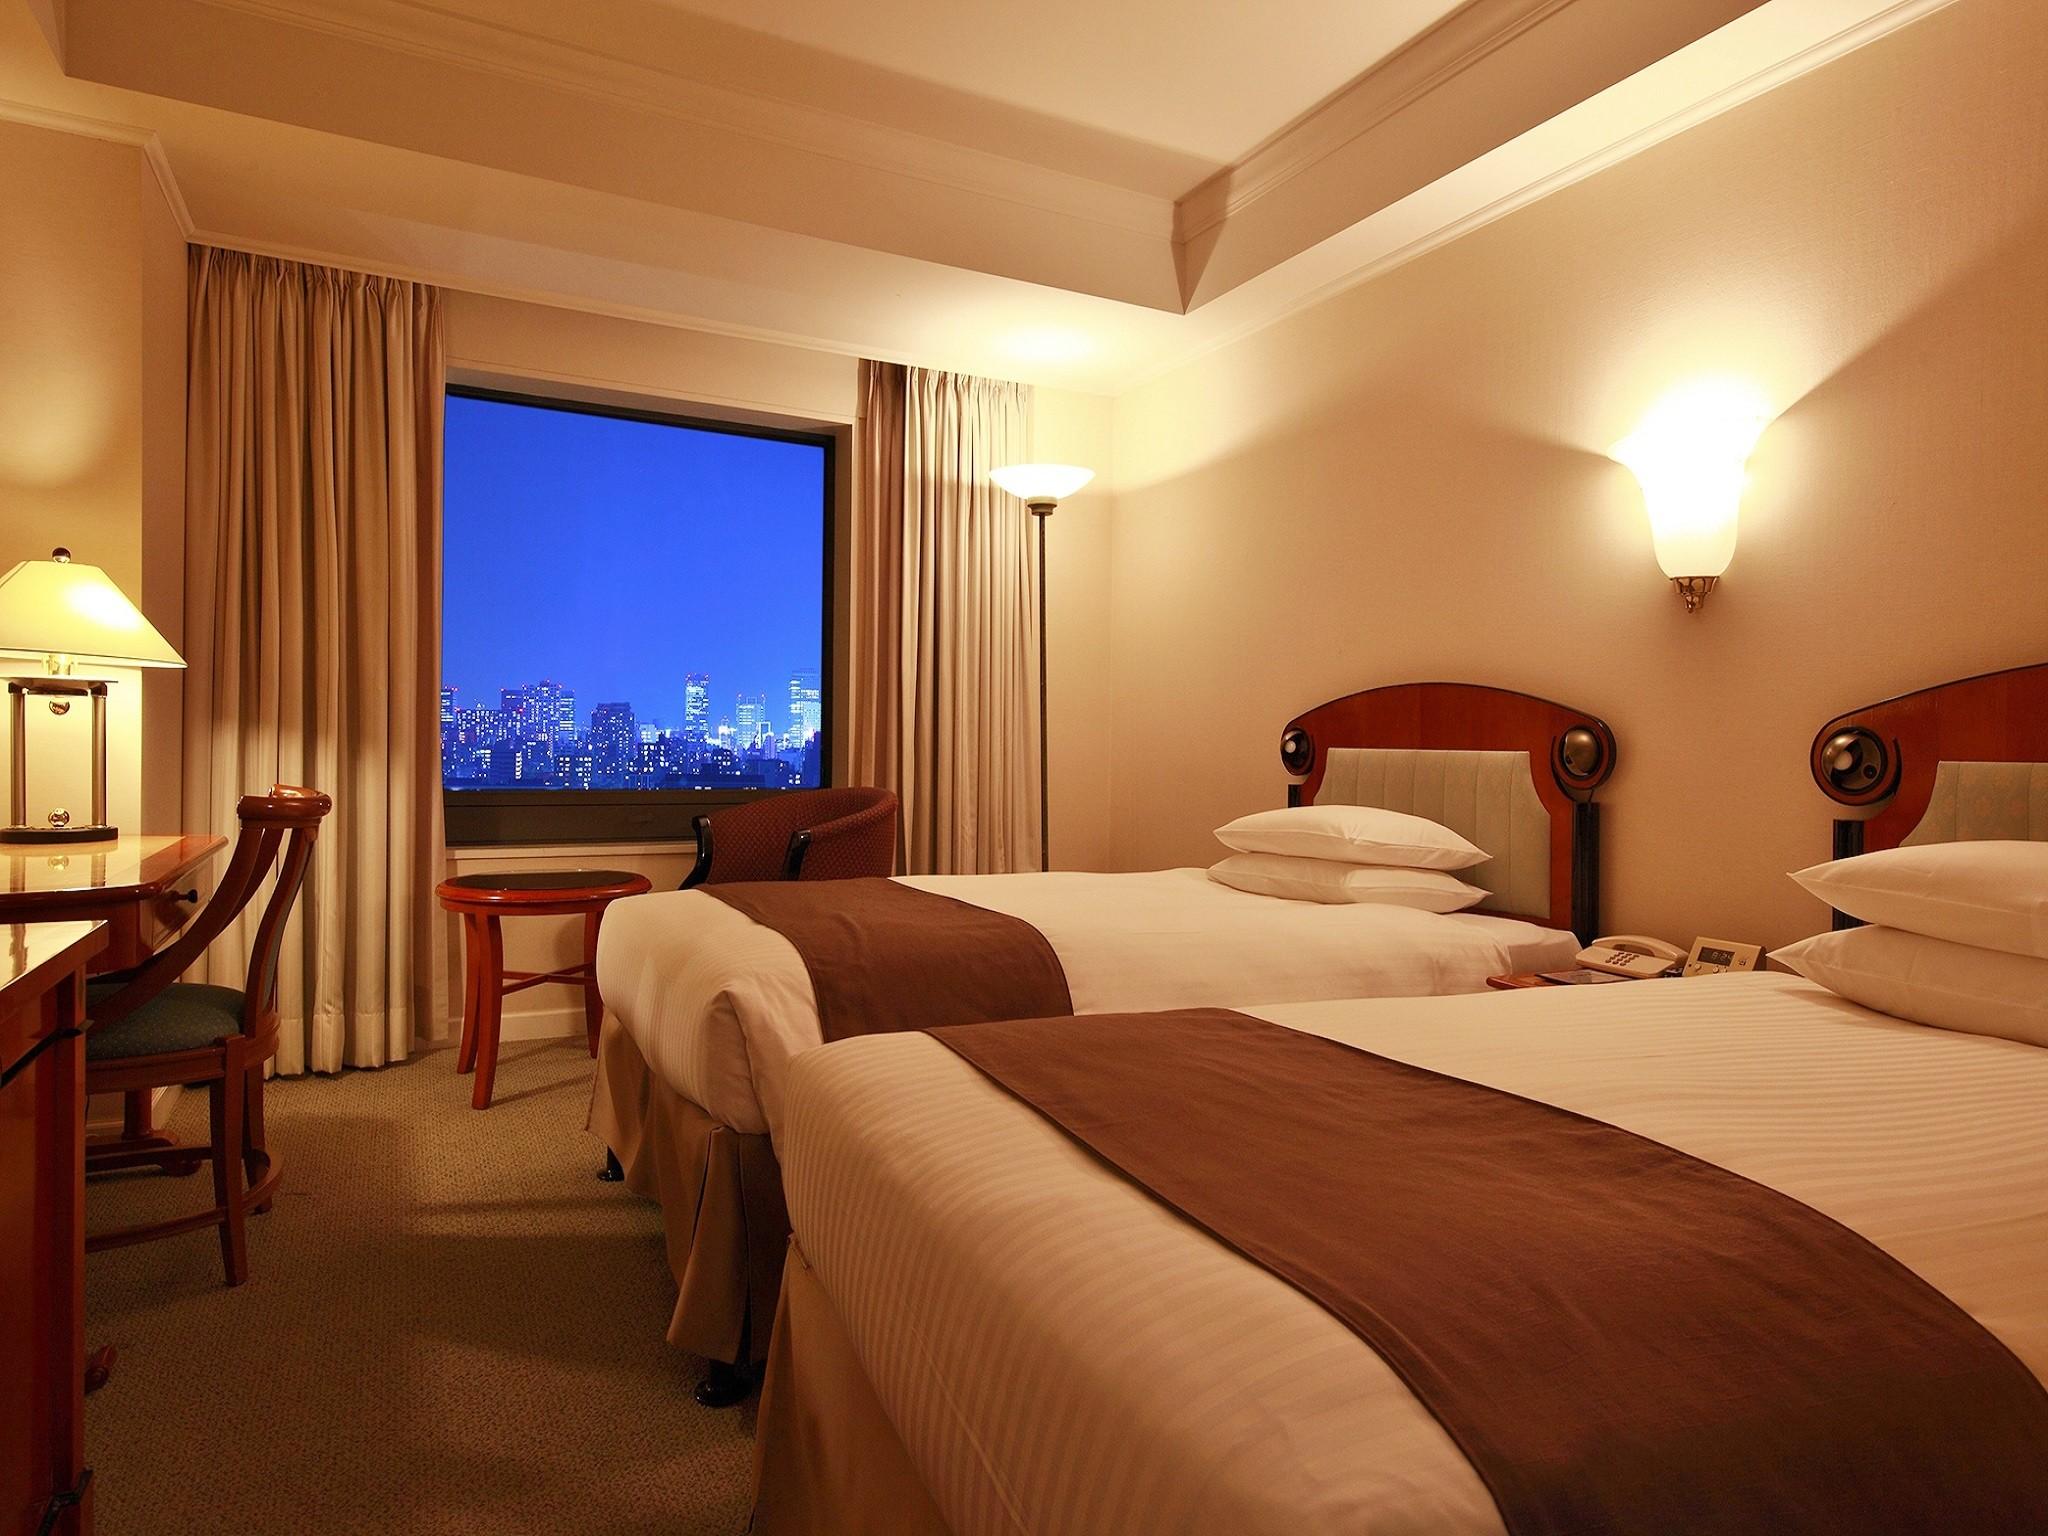 Hotel 21 East tokyo Awesome Hotel East 21 tokyo Okura Hotels & Resorts Japan